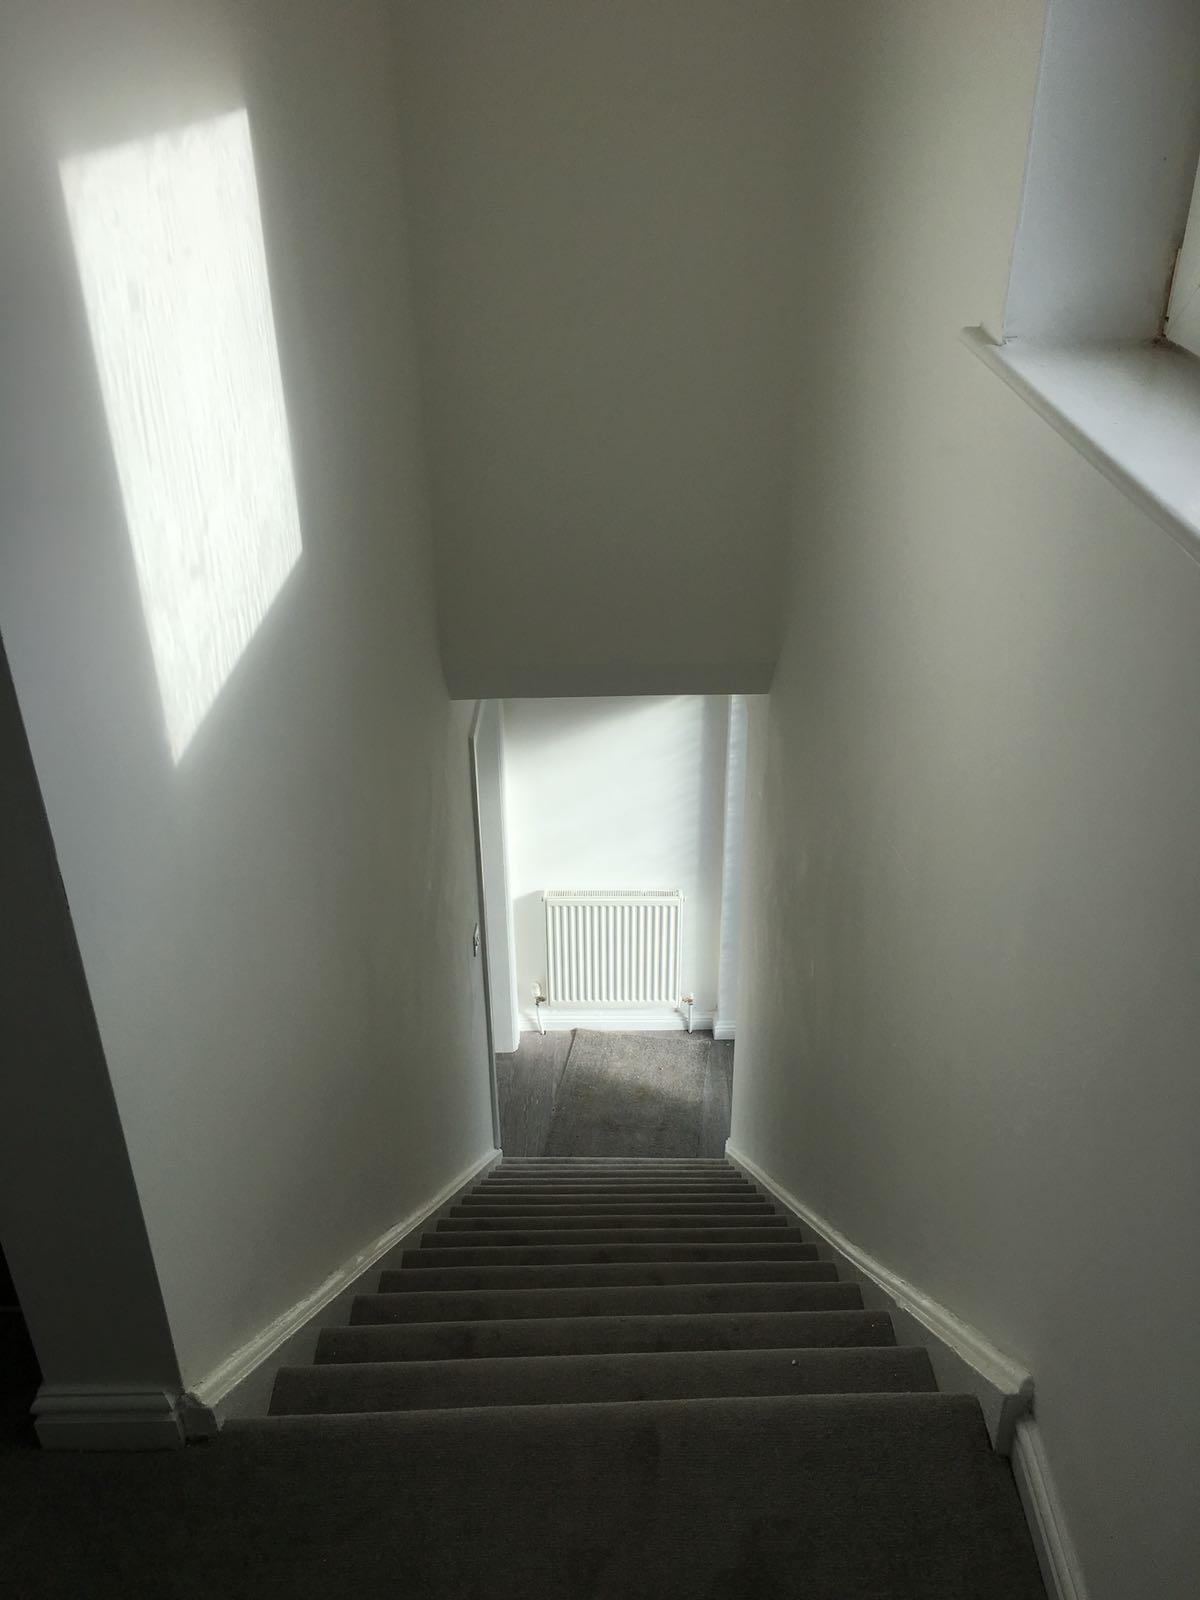 9 Macbeth Road, Dunfermline Stairs